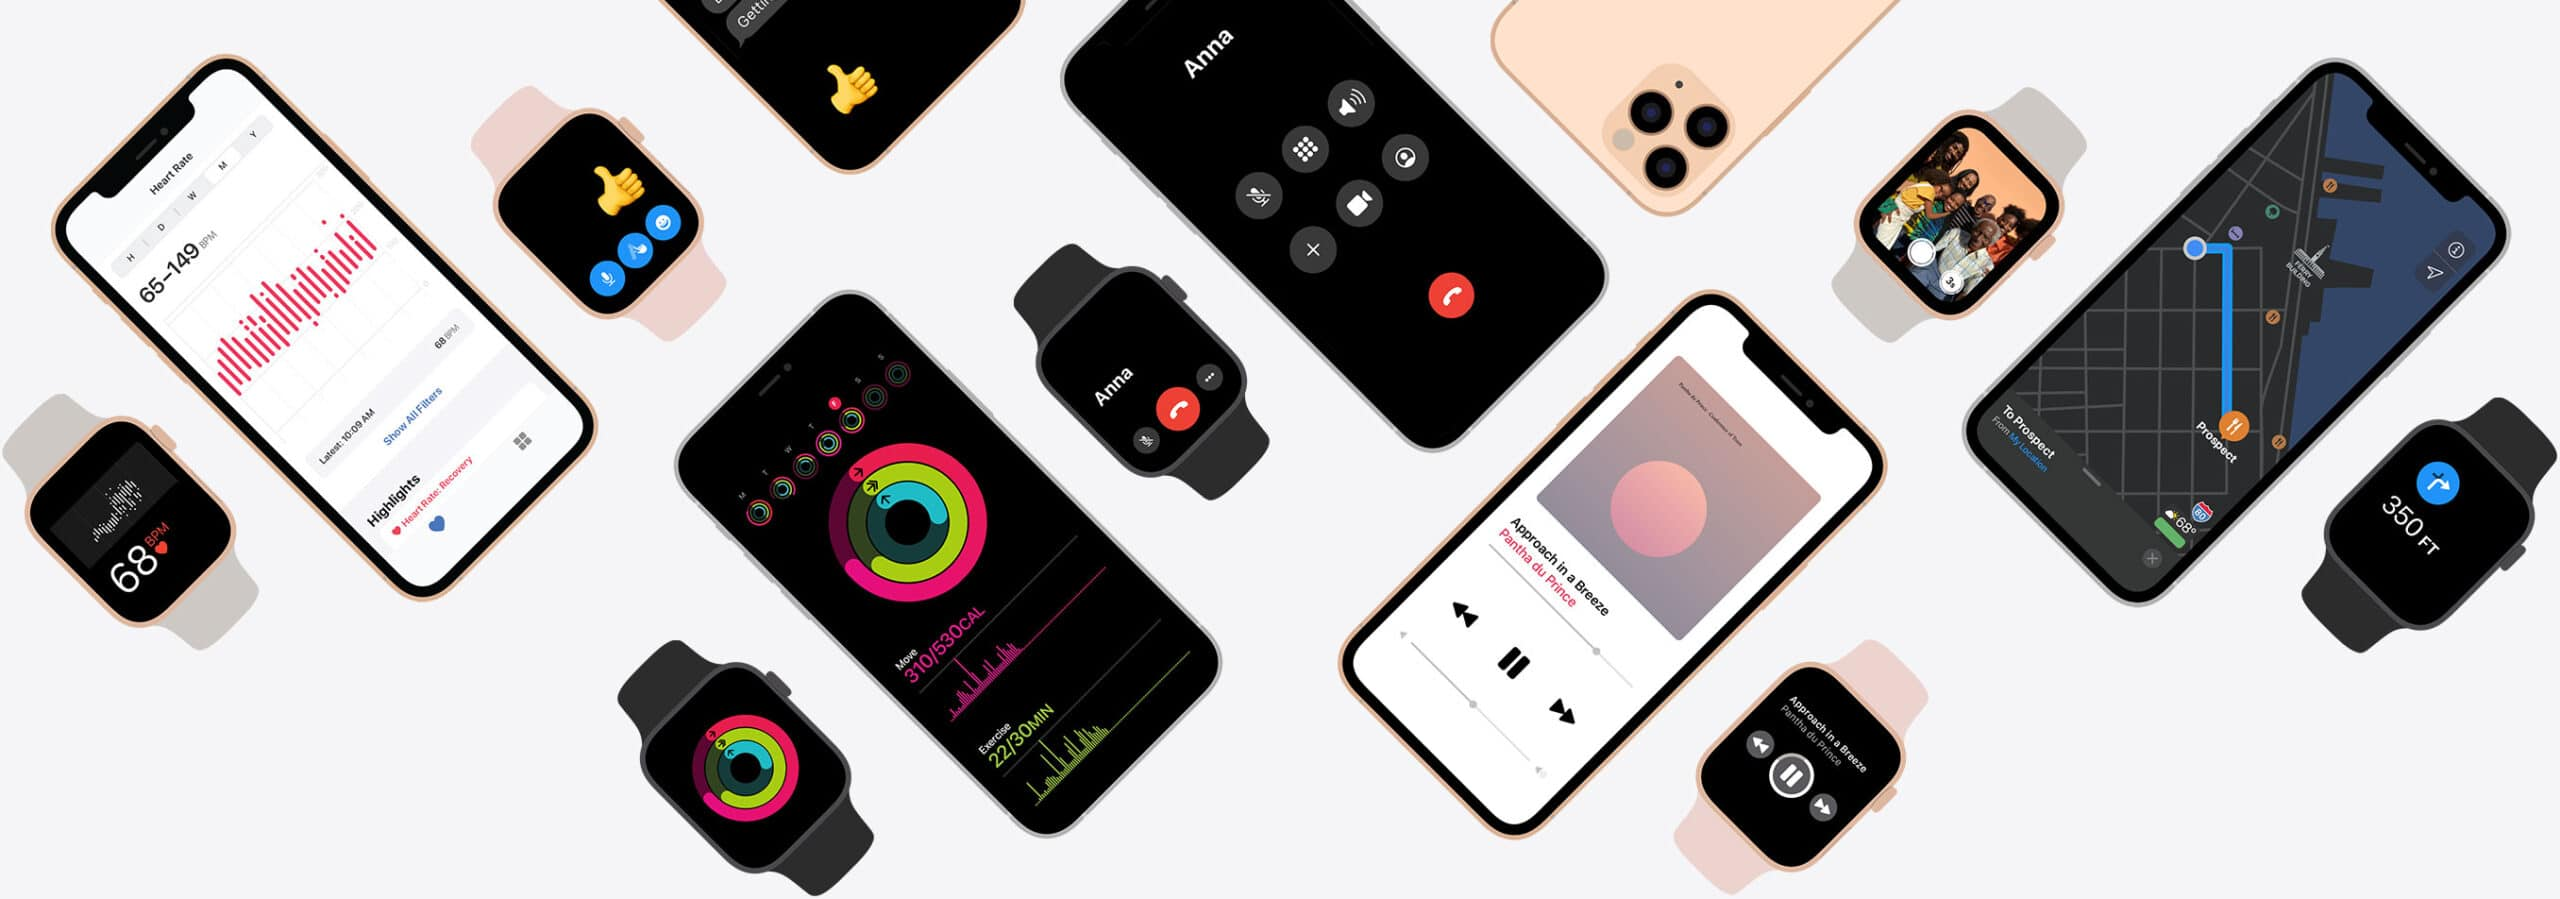 Gráfico hero com iPhones e Apple Watches